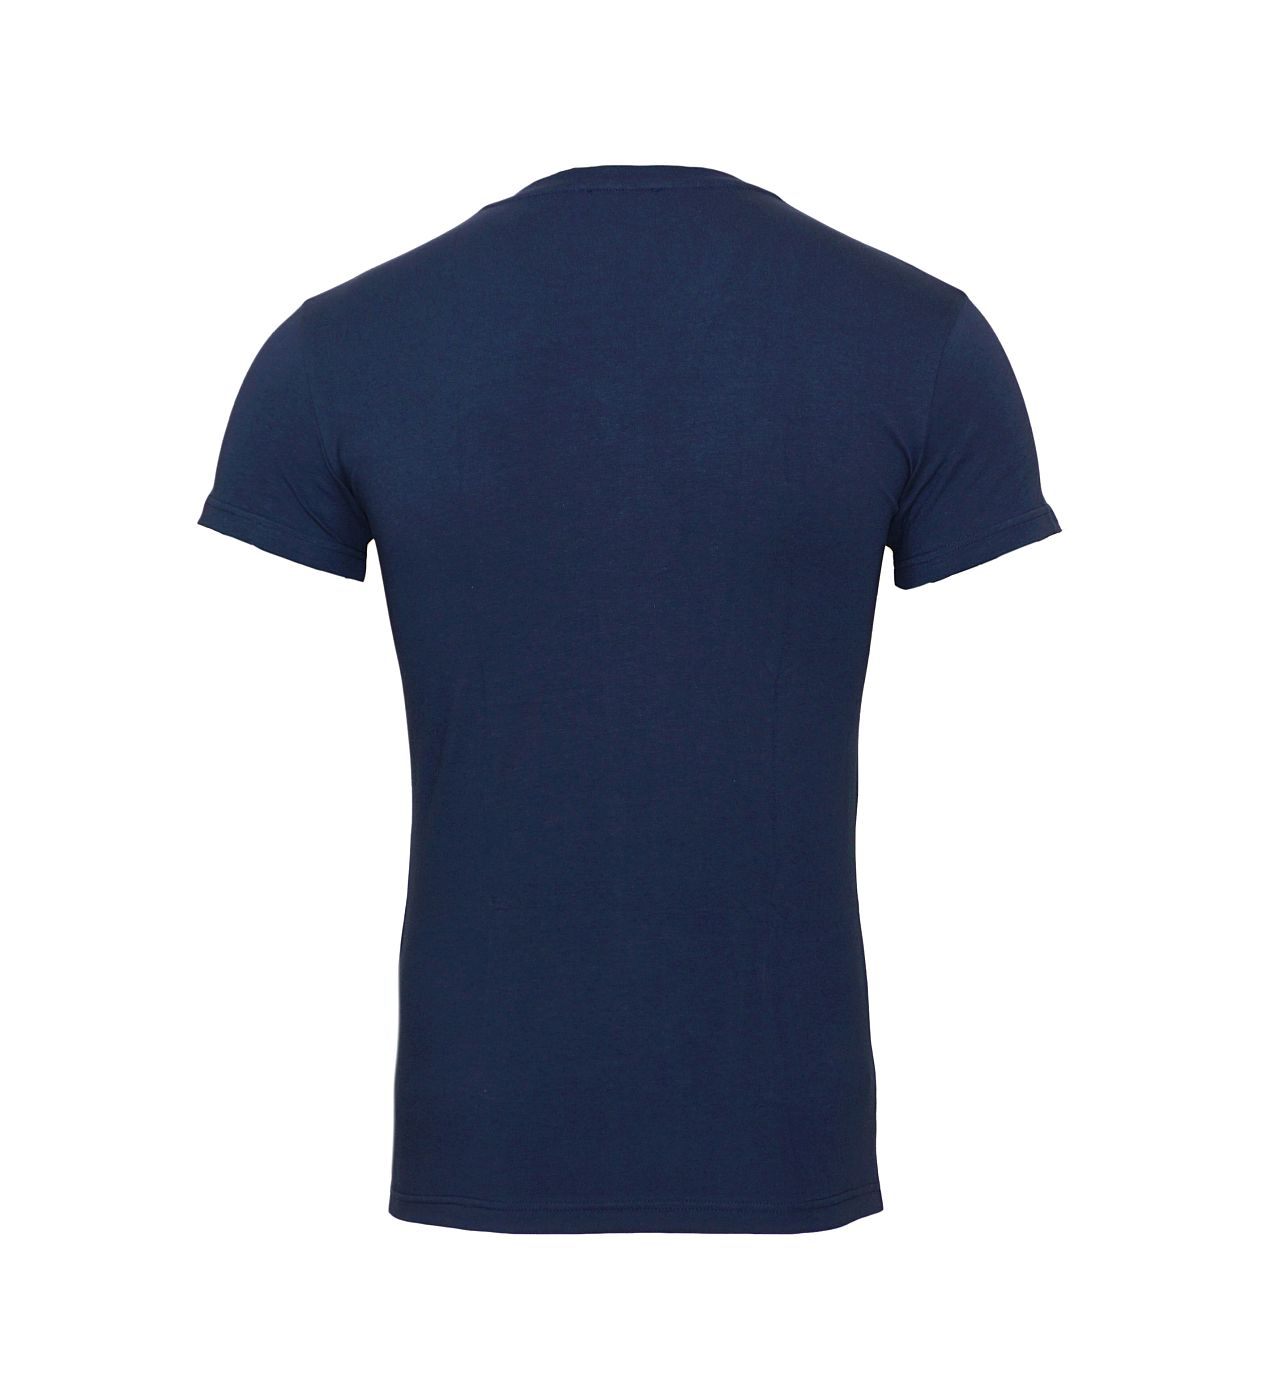 Emporio Armani T-Shirts V-Ausschnitt 110810 8A516 00135 MARINE SH18-EAT2